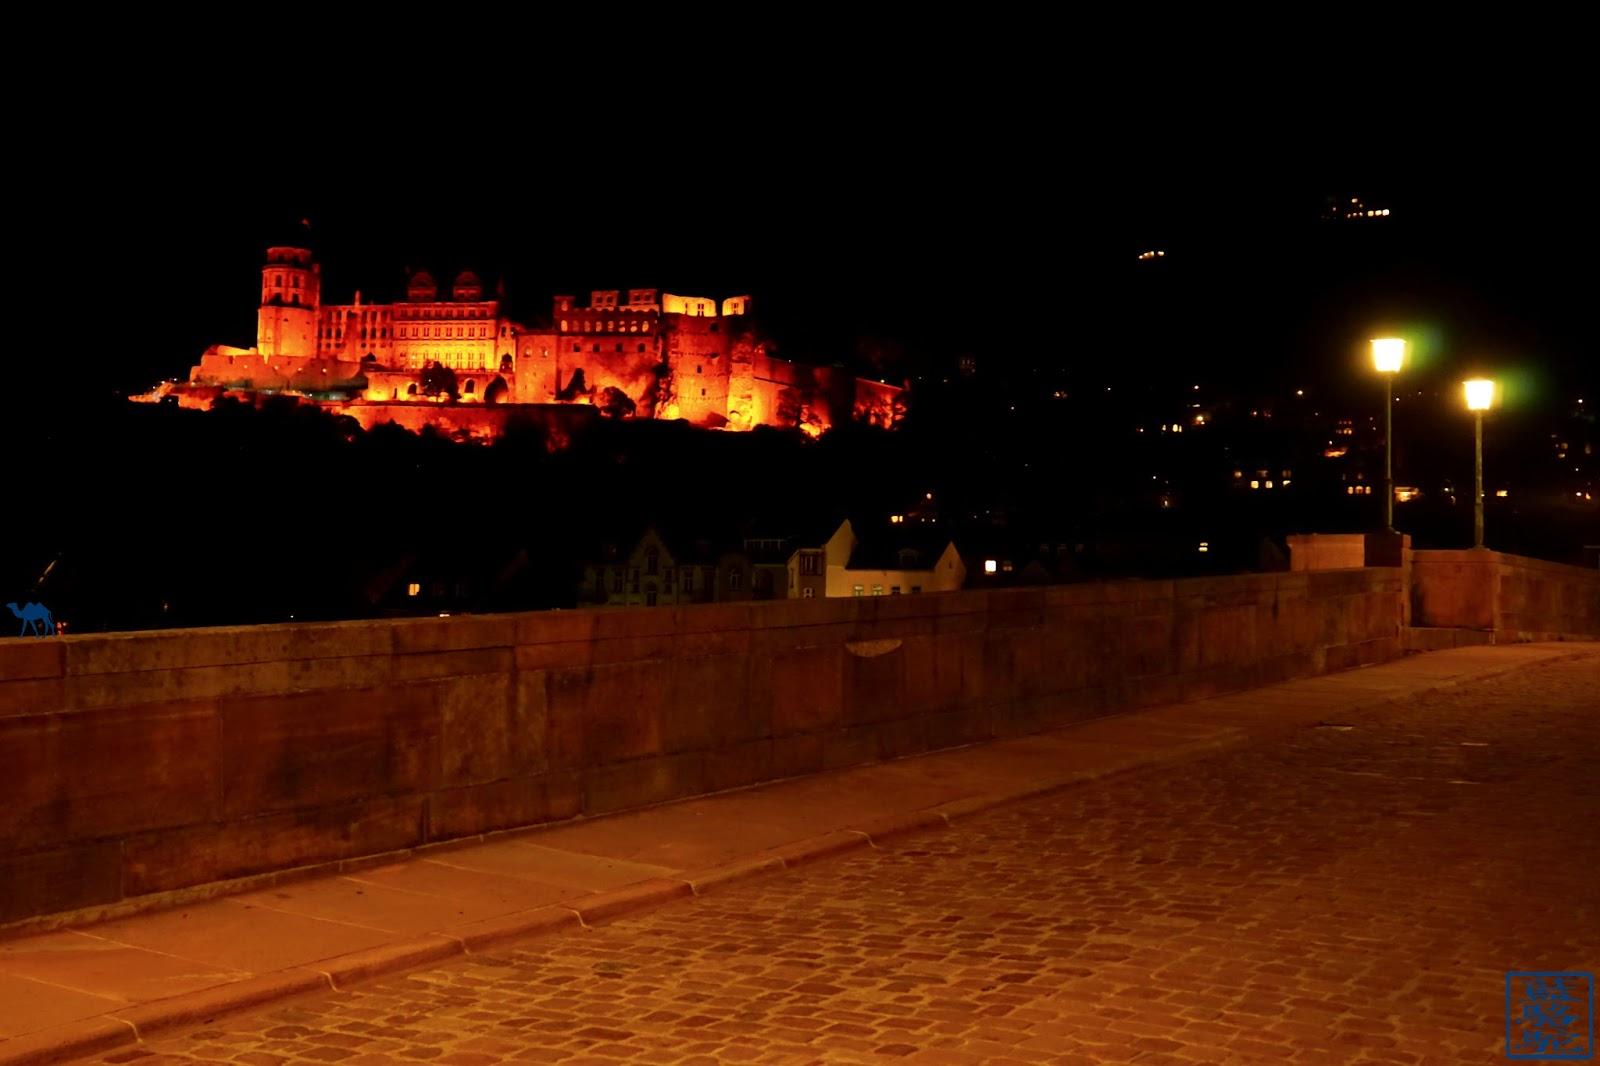 Le Chameau Bleu - Blog Voyage Heildeberg Allemagne - Chateau d`Heidelberg by night